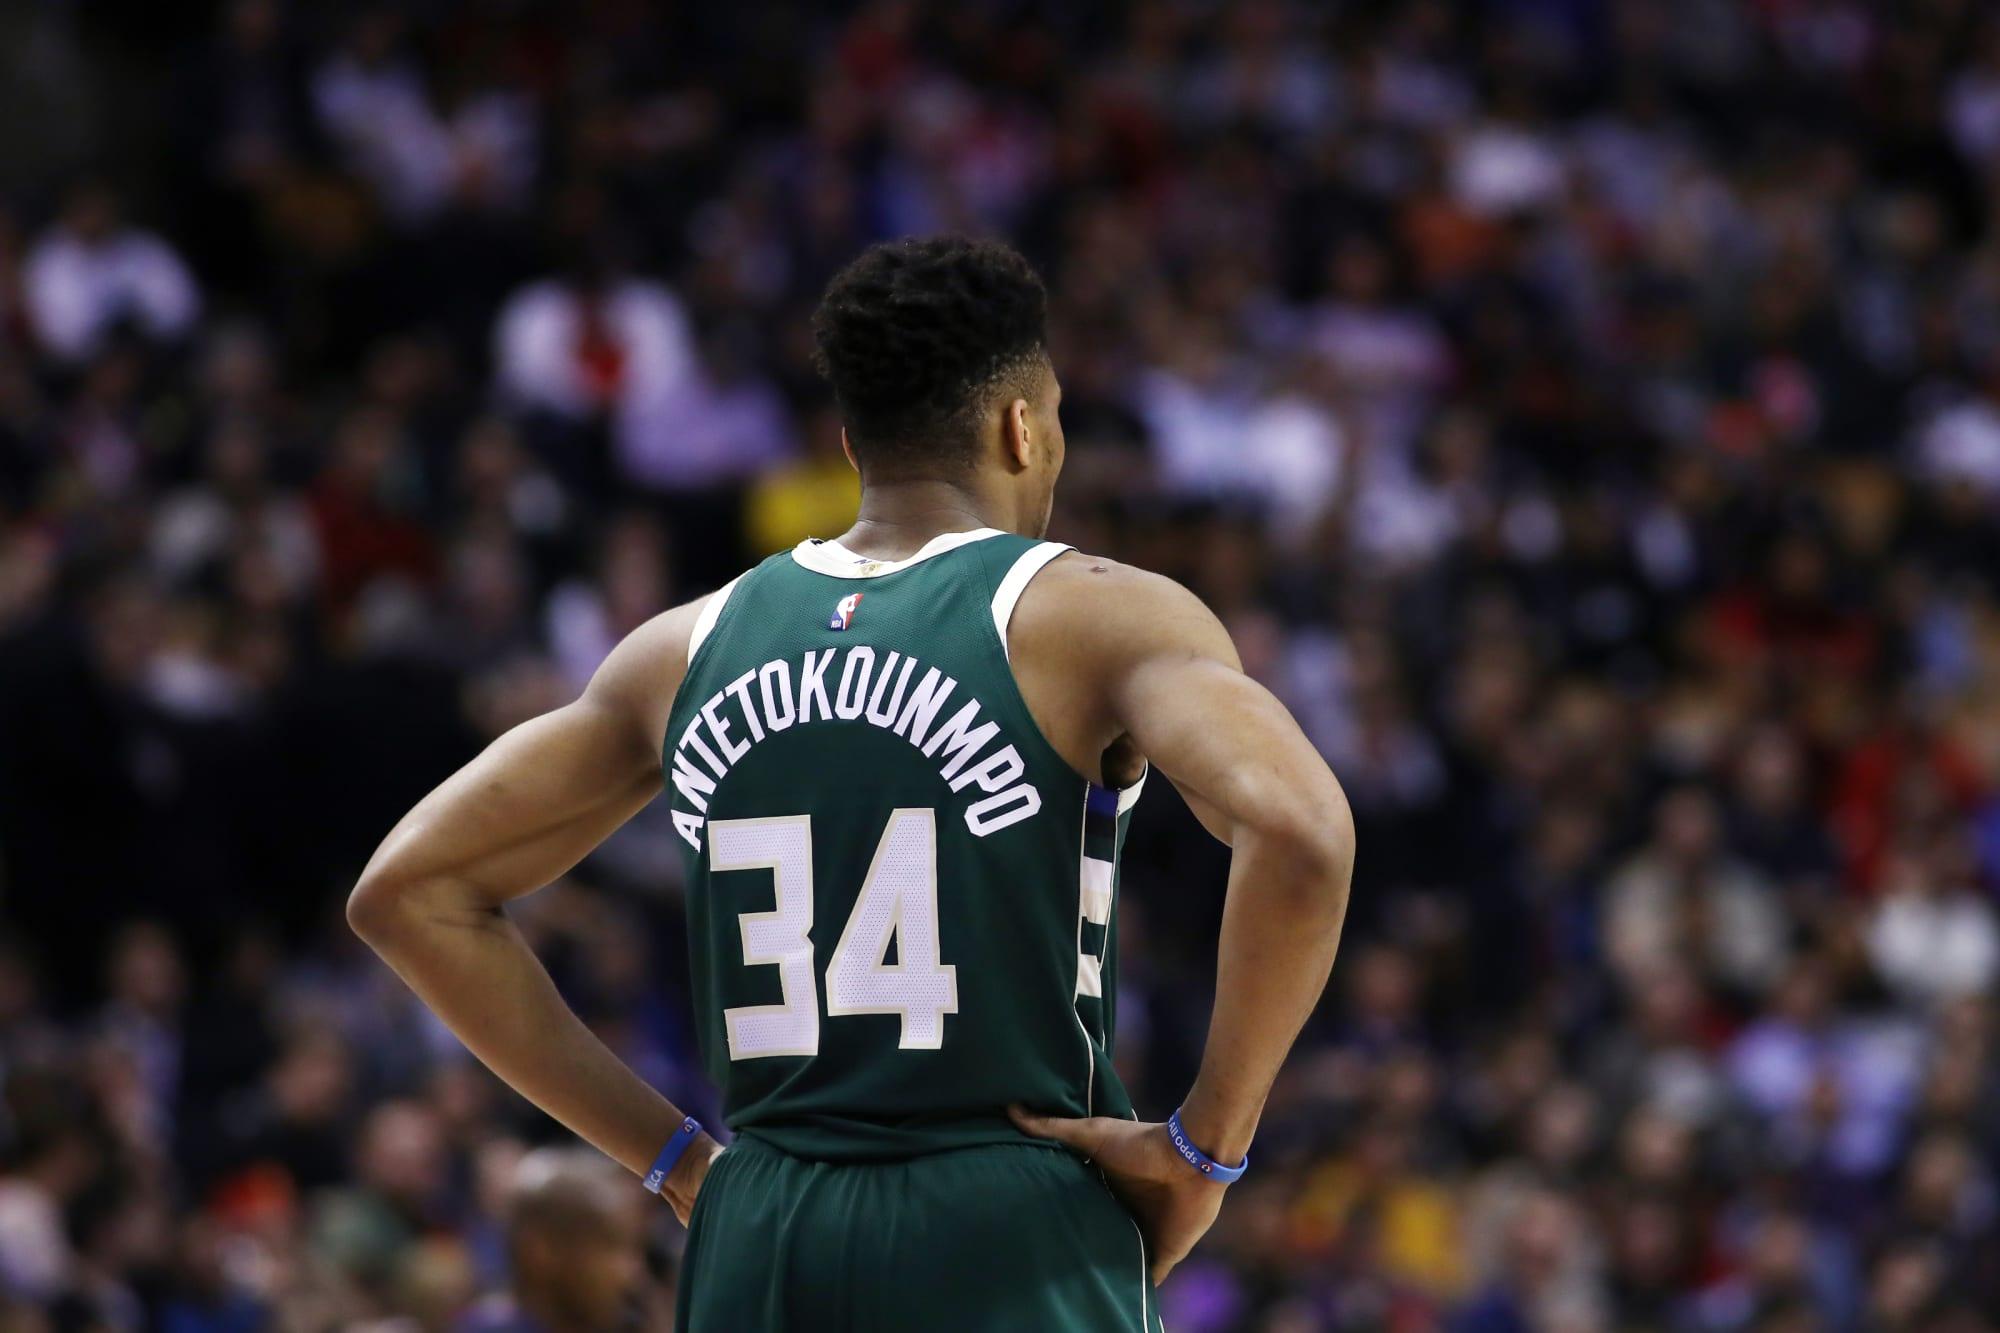 Toronto Raptors should not pursue Giannis Antetokounmpo